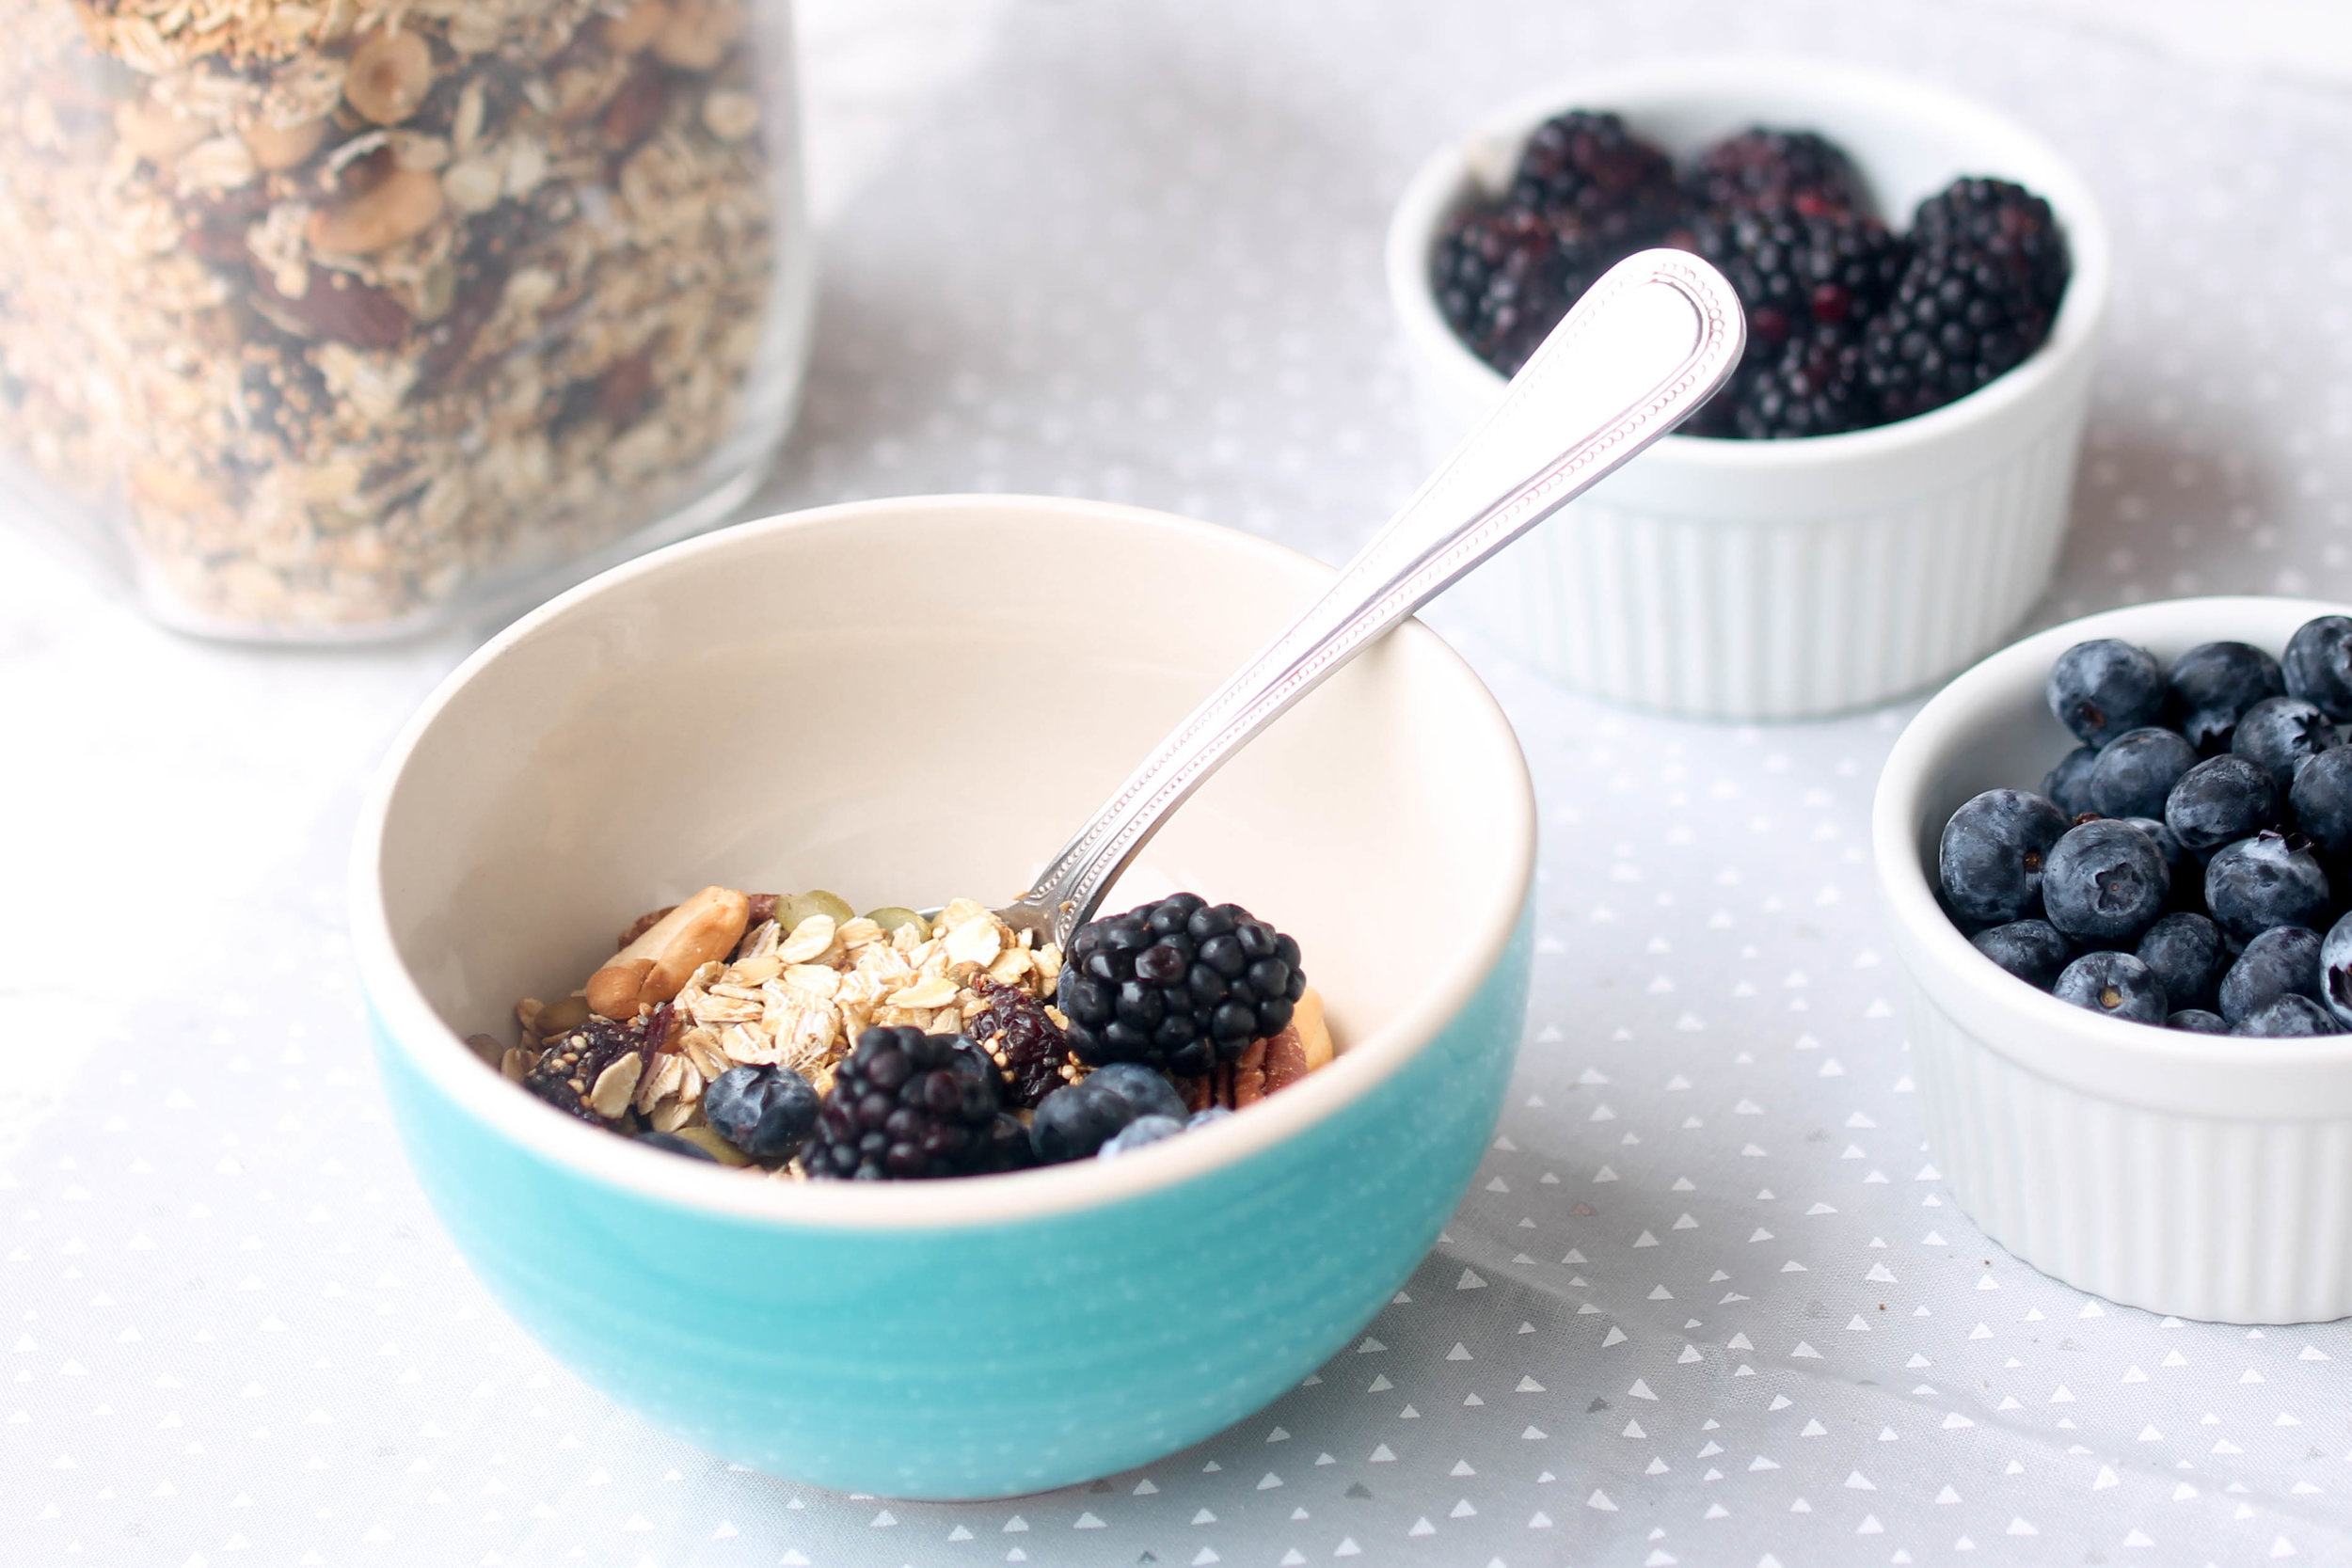 Homemade Muesli - quick, nutritious breakfast and snack option! Vegan and Gluten-Free.